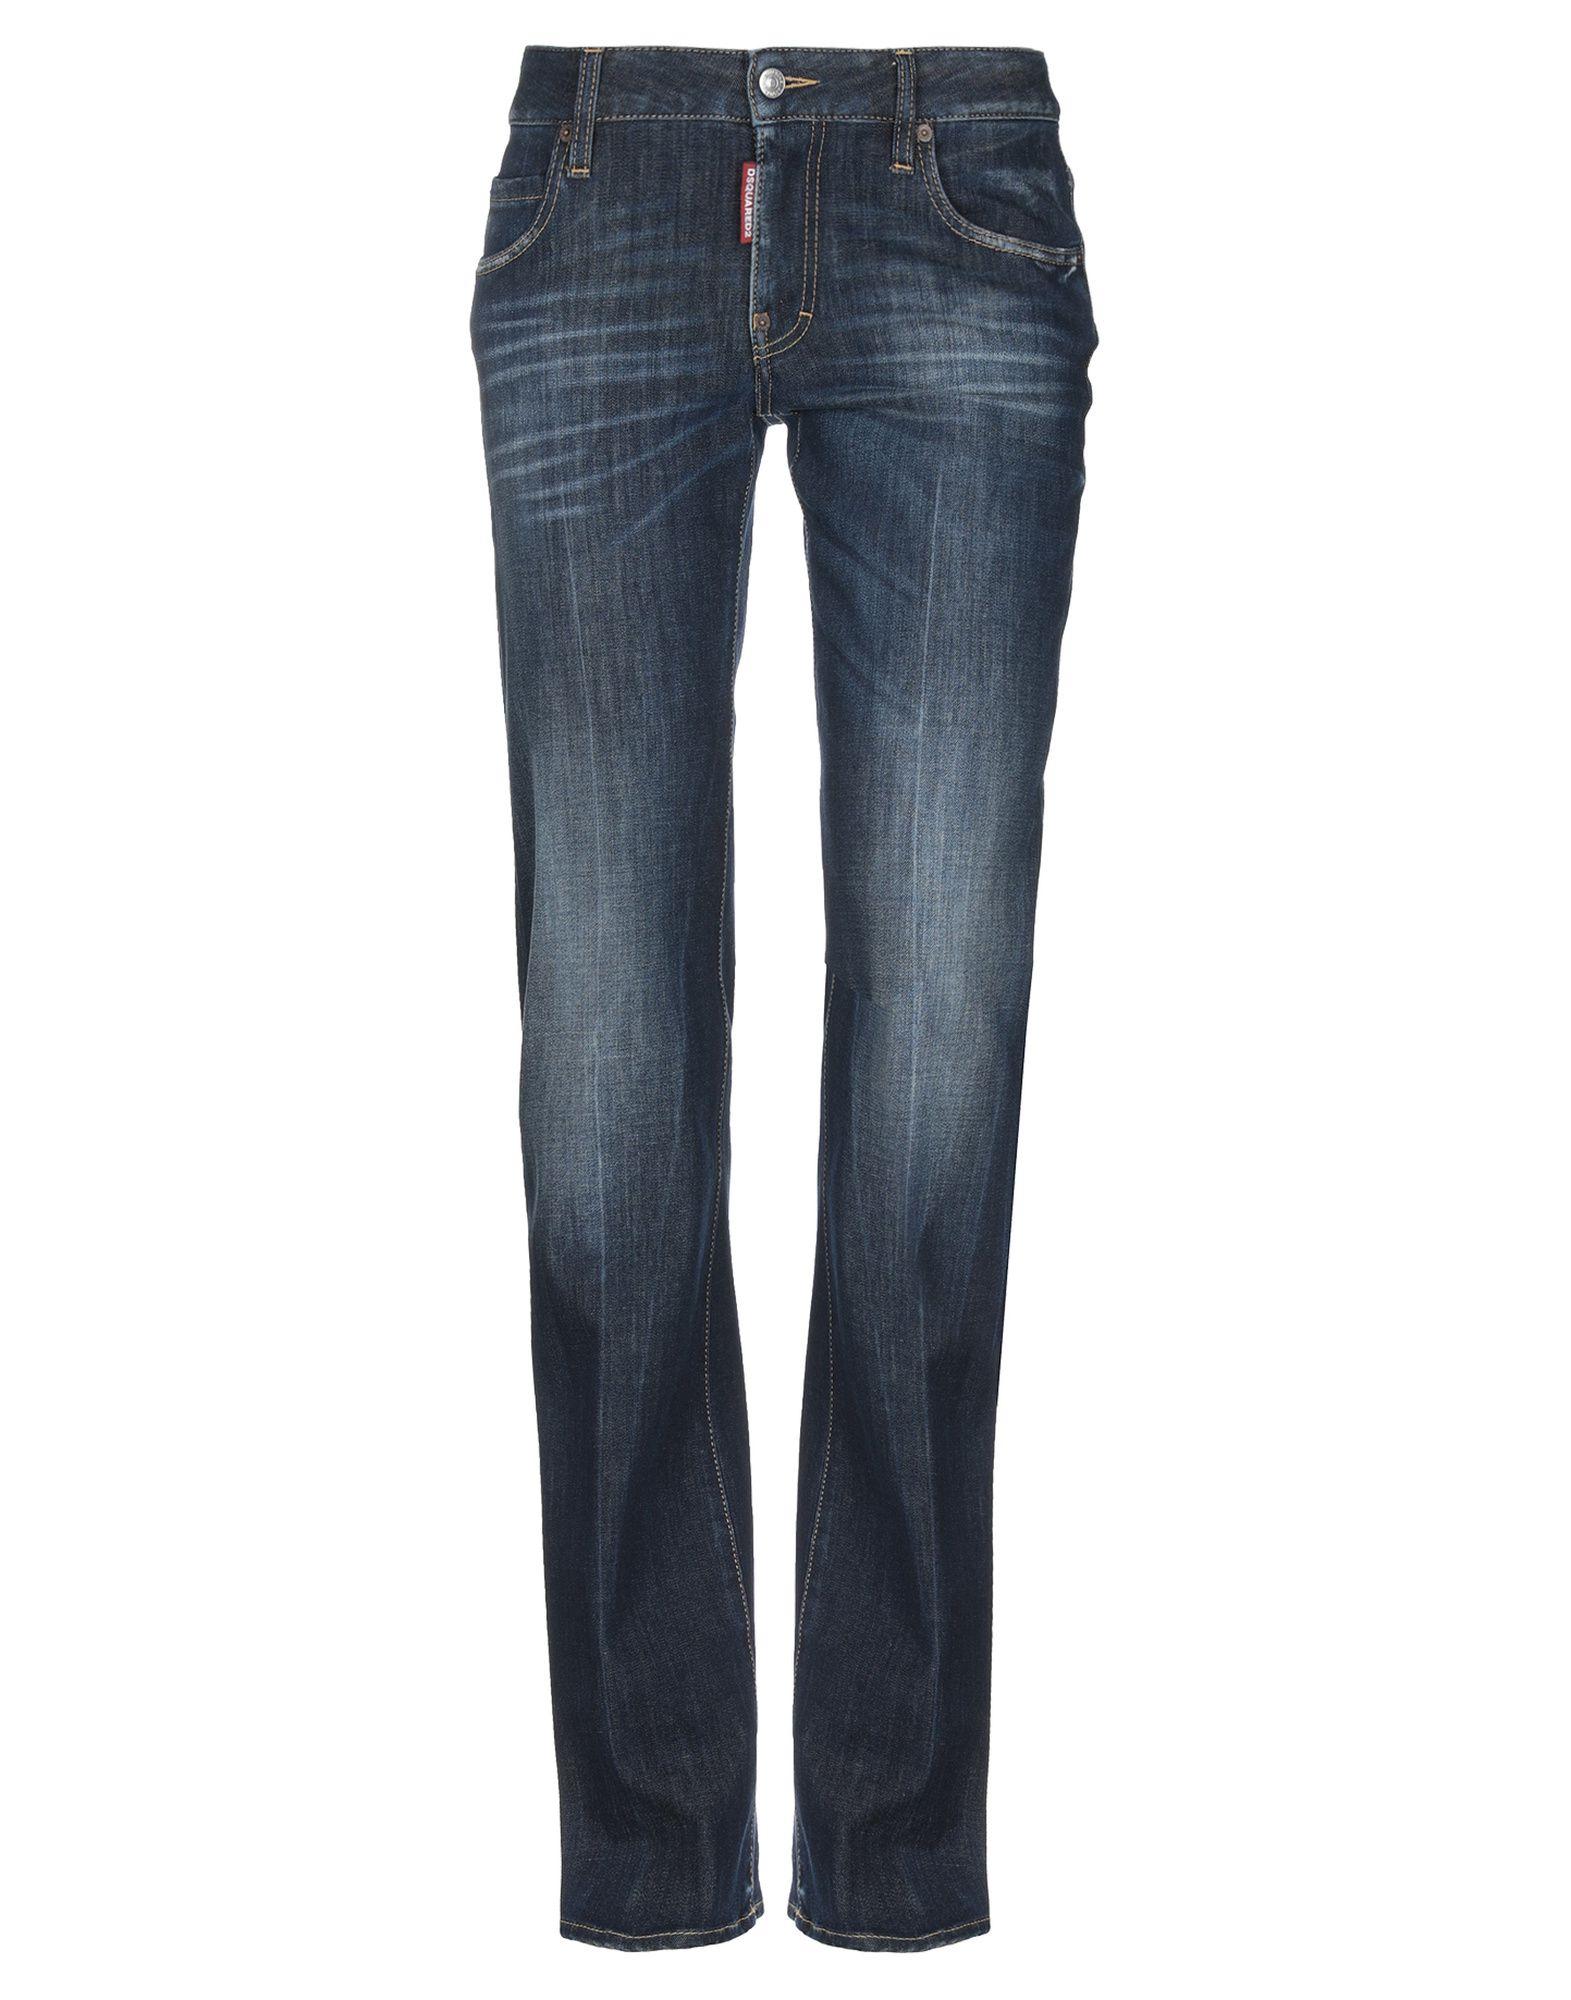 DSQUARED2 Denim pants - Item 42731065